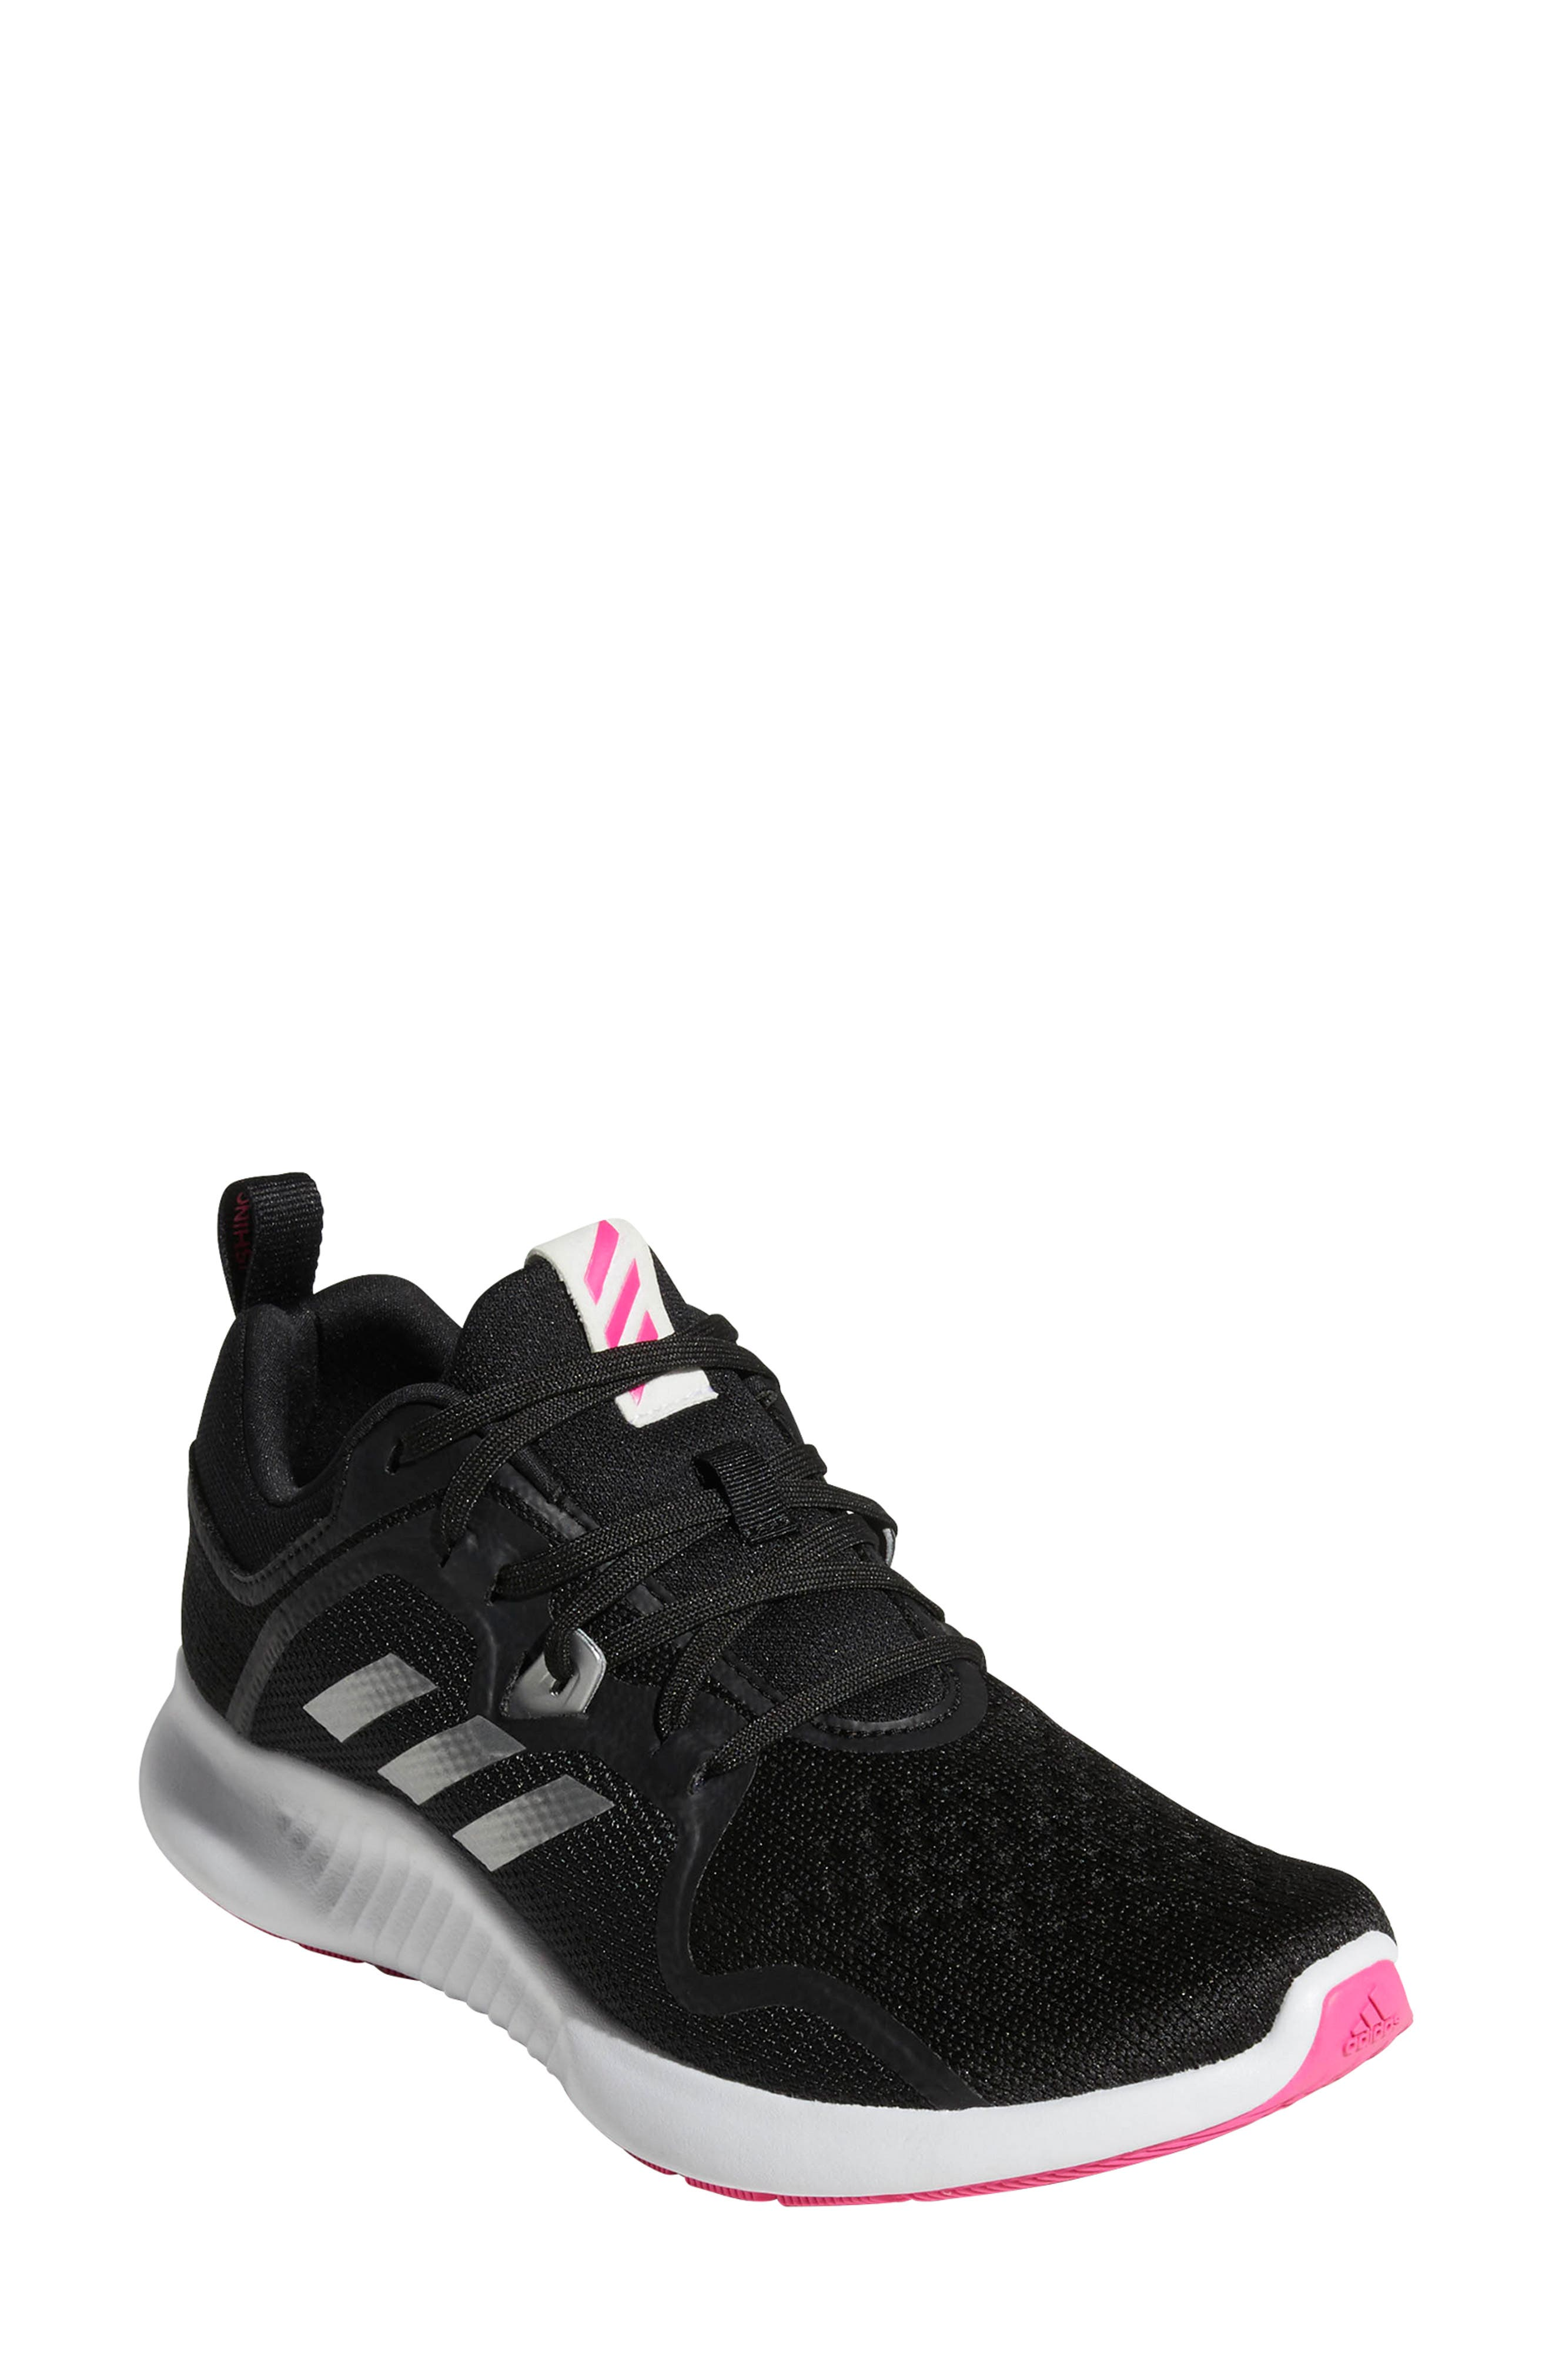 EdgeBounce Running Shoe,                         Main,                         color, 001